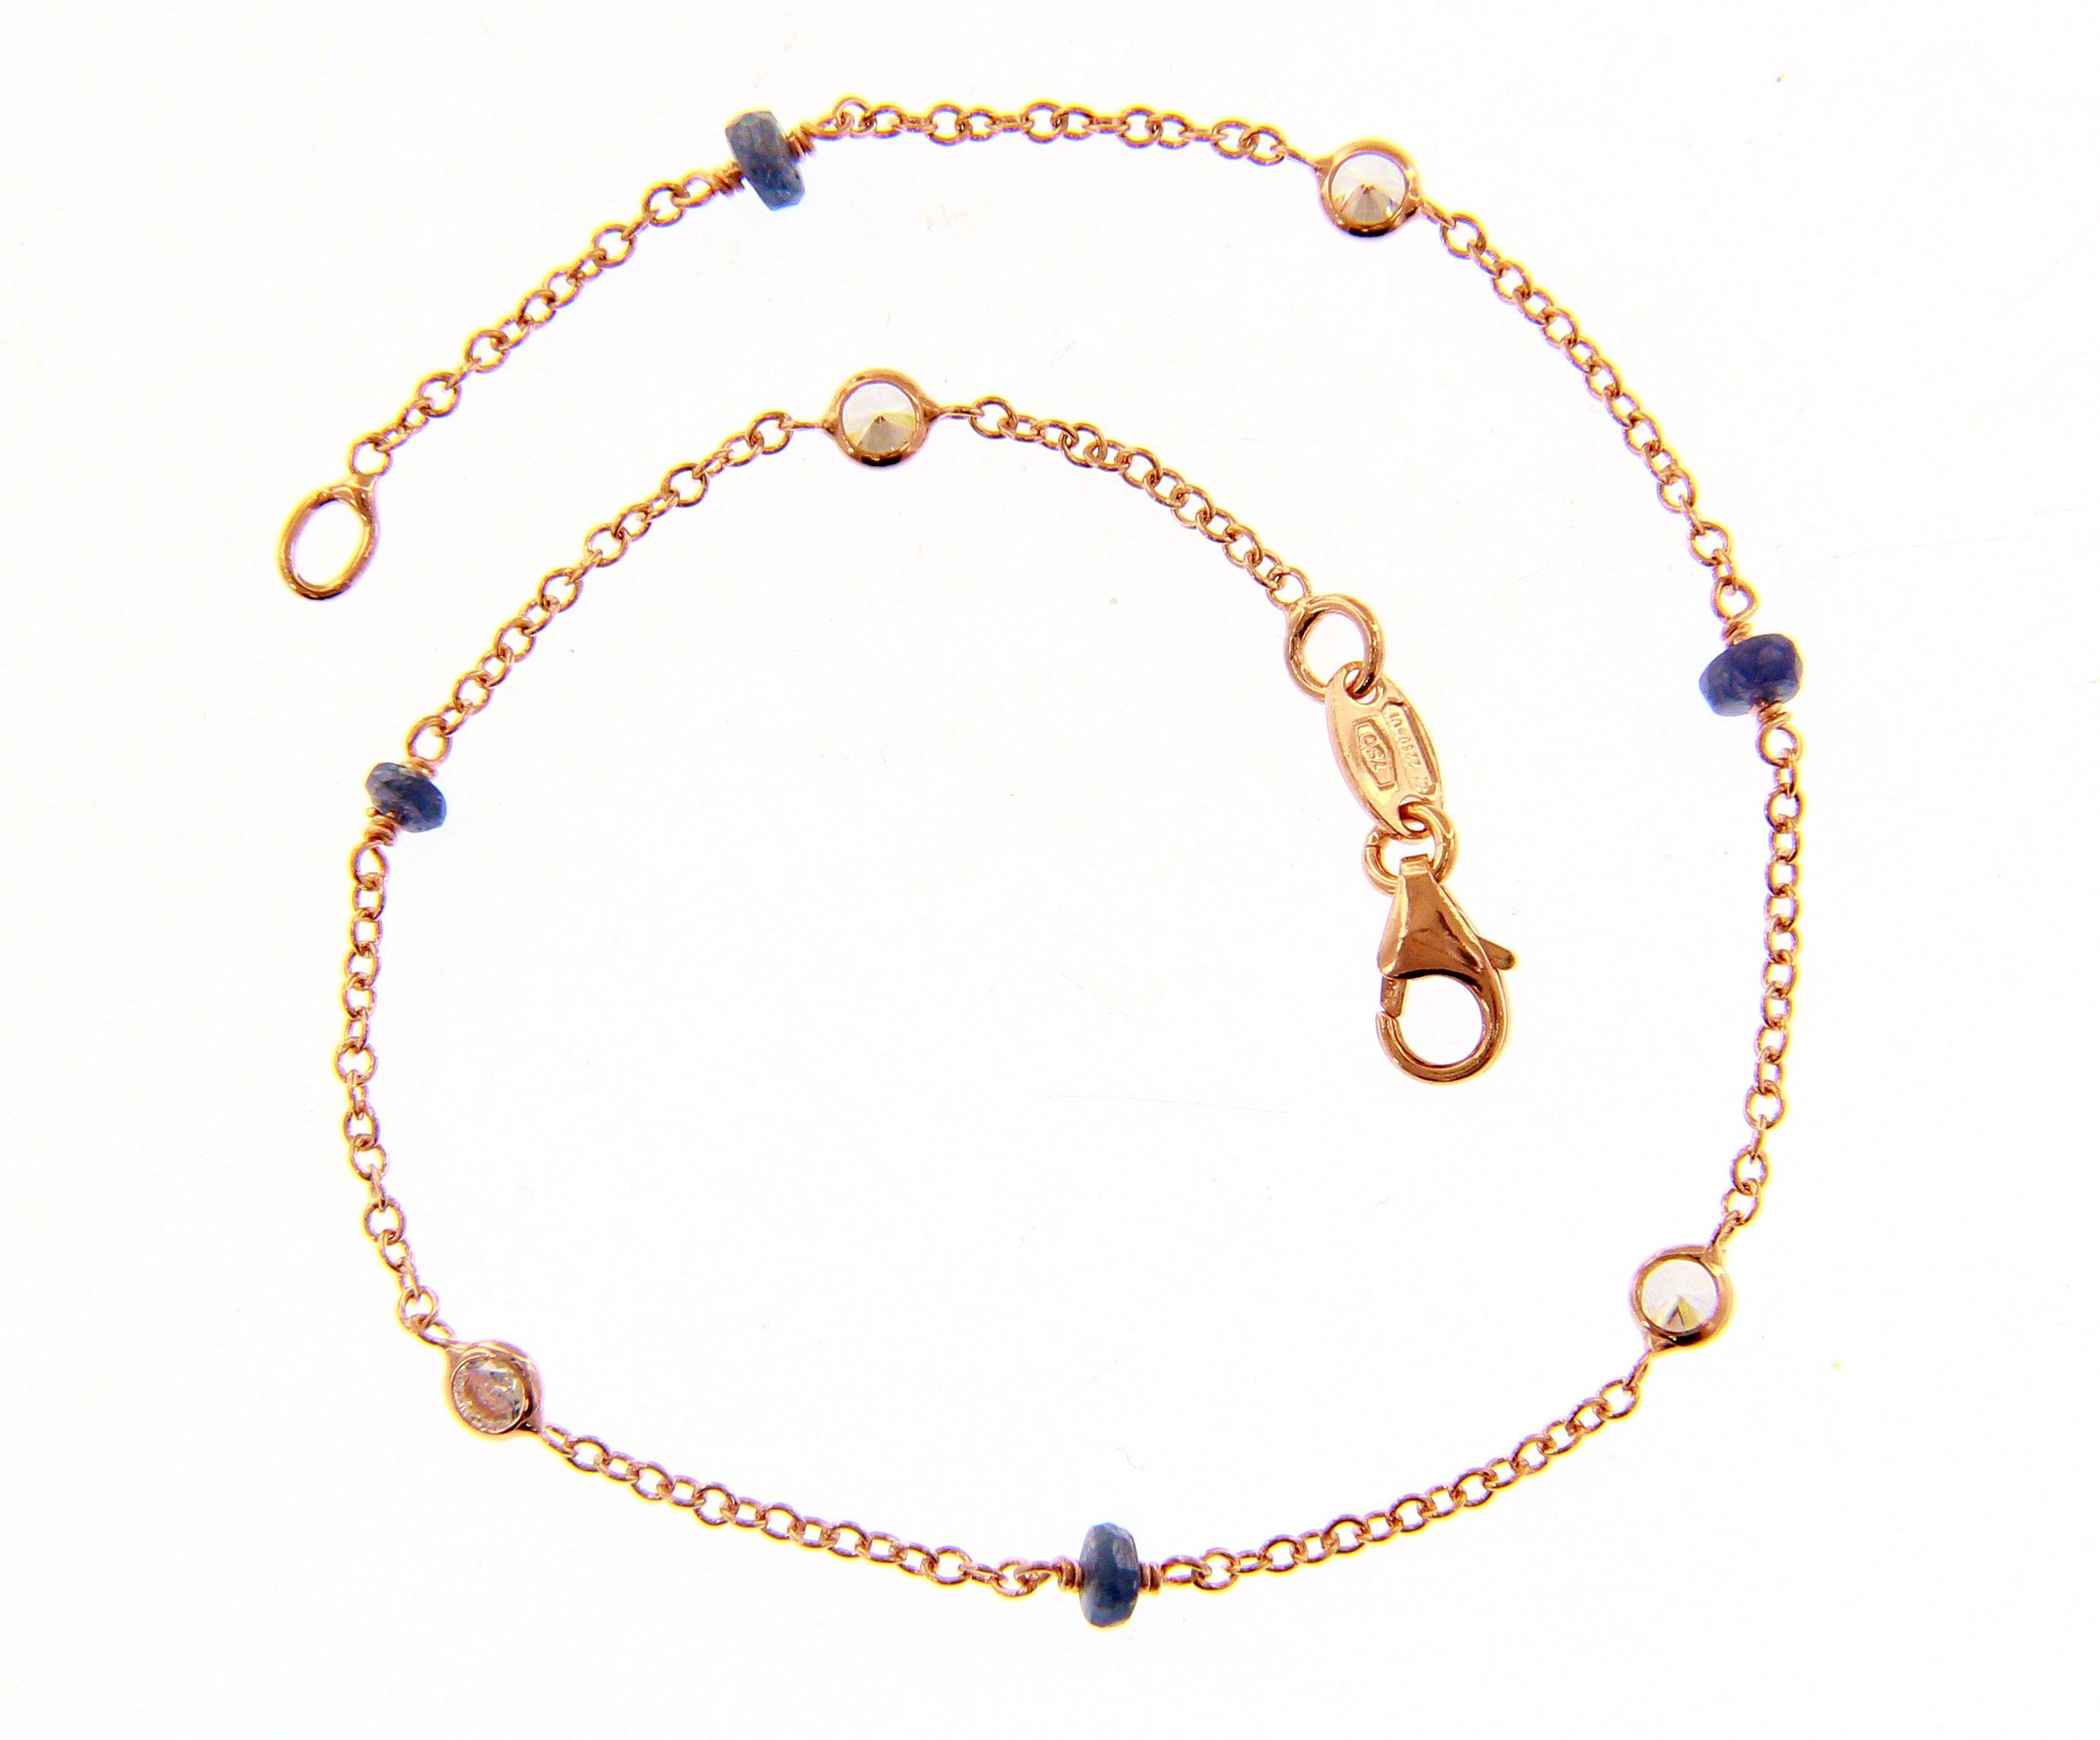 pulsera mujer oro rosa circonitas piedras azules - brazalete oro mujer para comprar en joyeria online - mejores joyerias online españa - joyeria marga mira